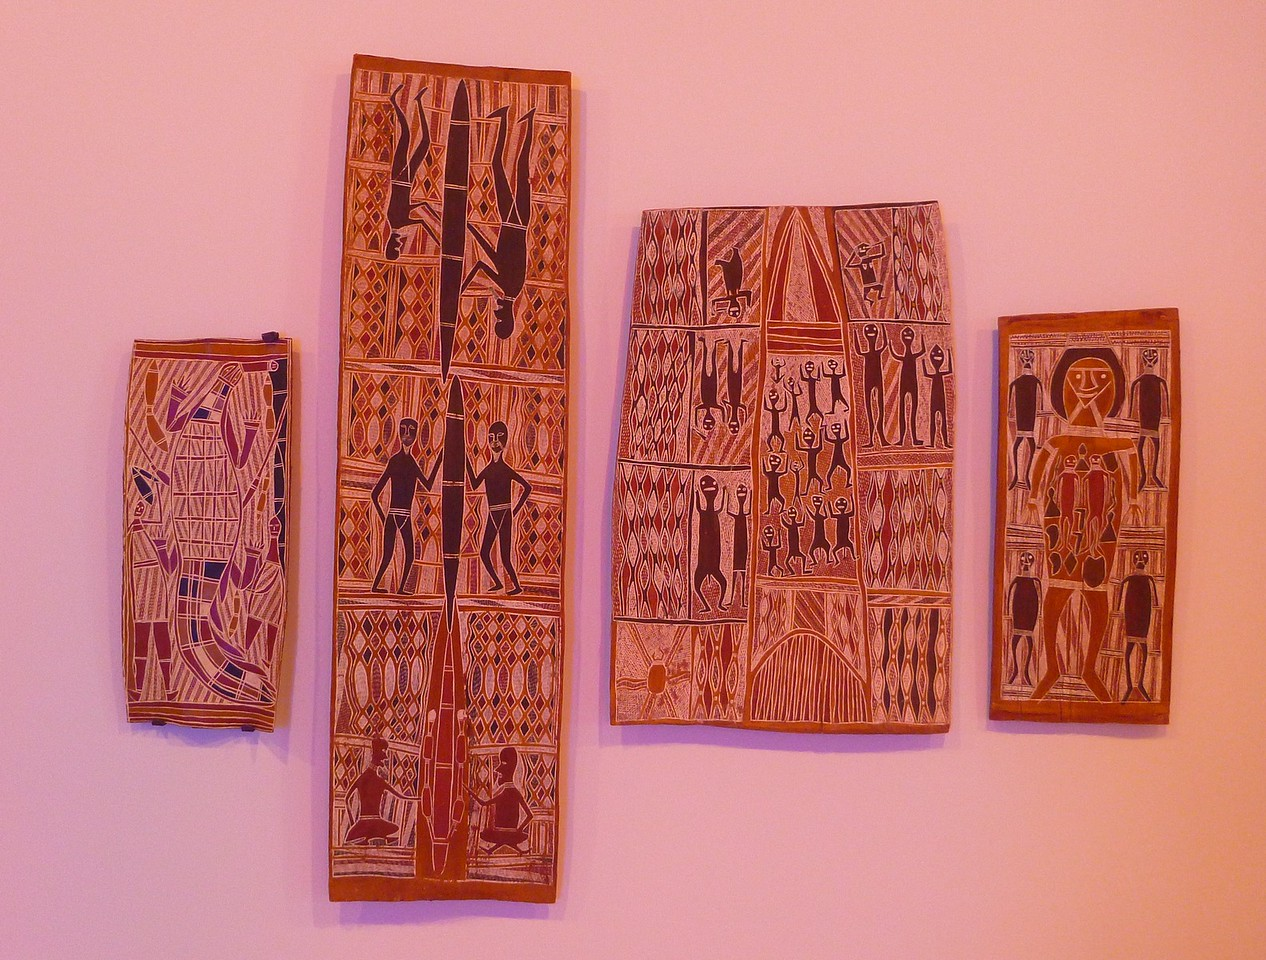 Sydney - Museum of Contemporary Art - Aborigine Art